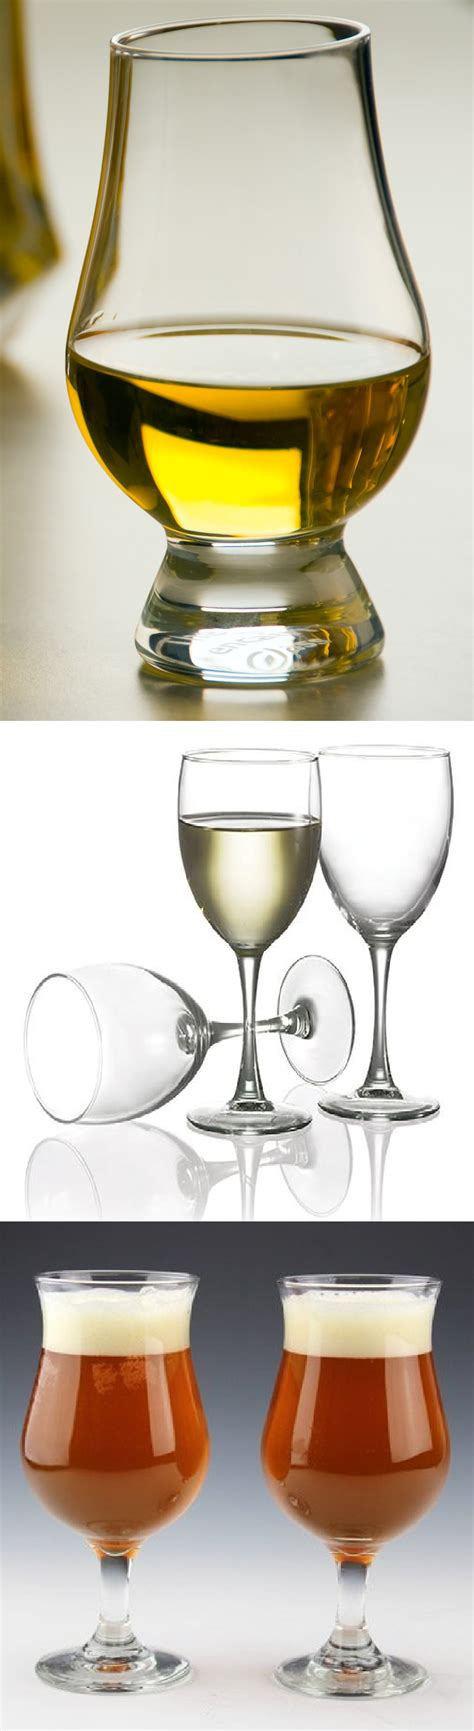 Best Barware - best barware shaker glasses displays examined living